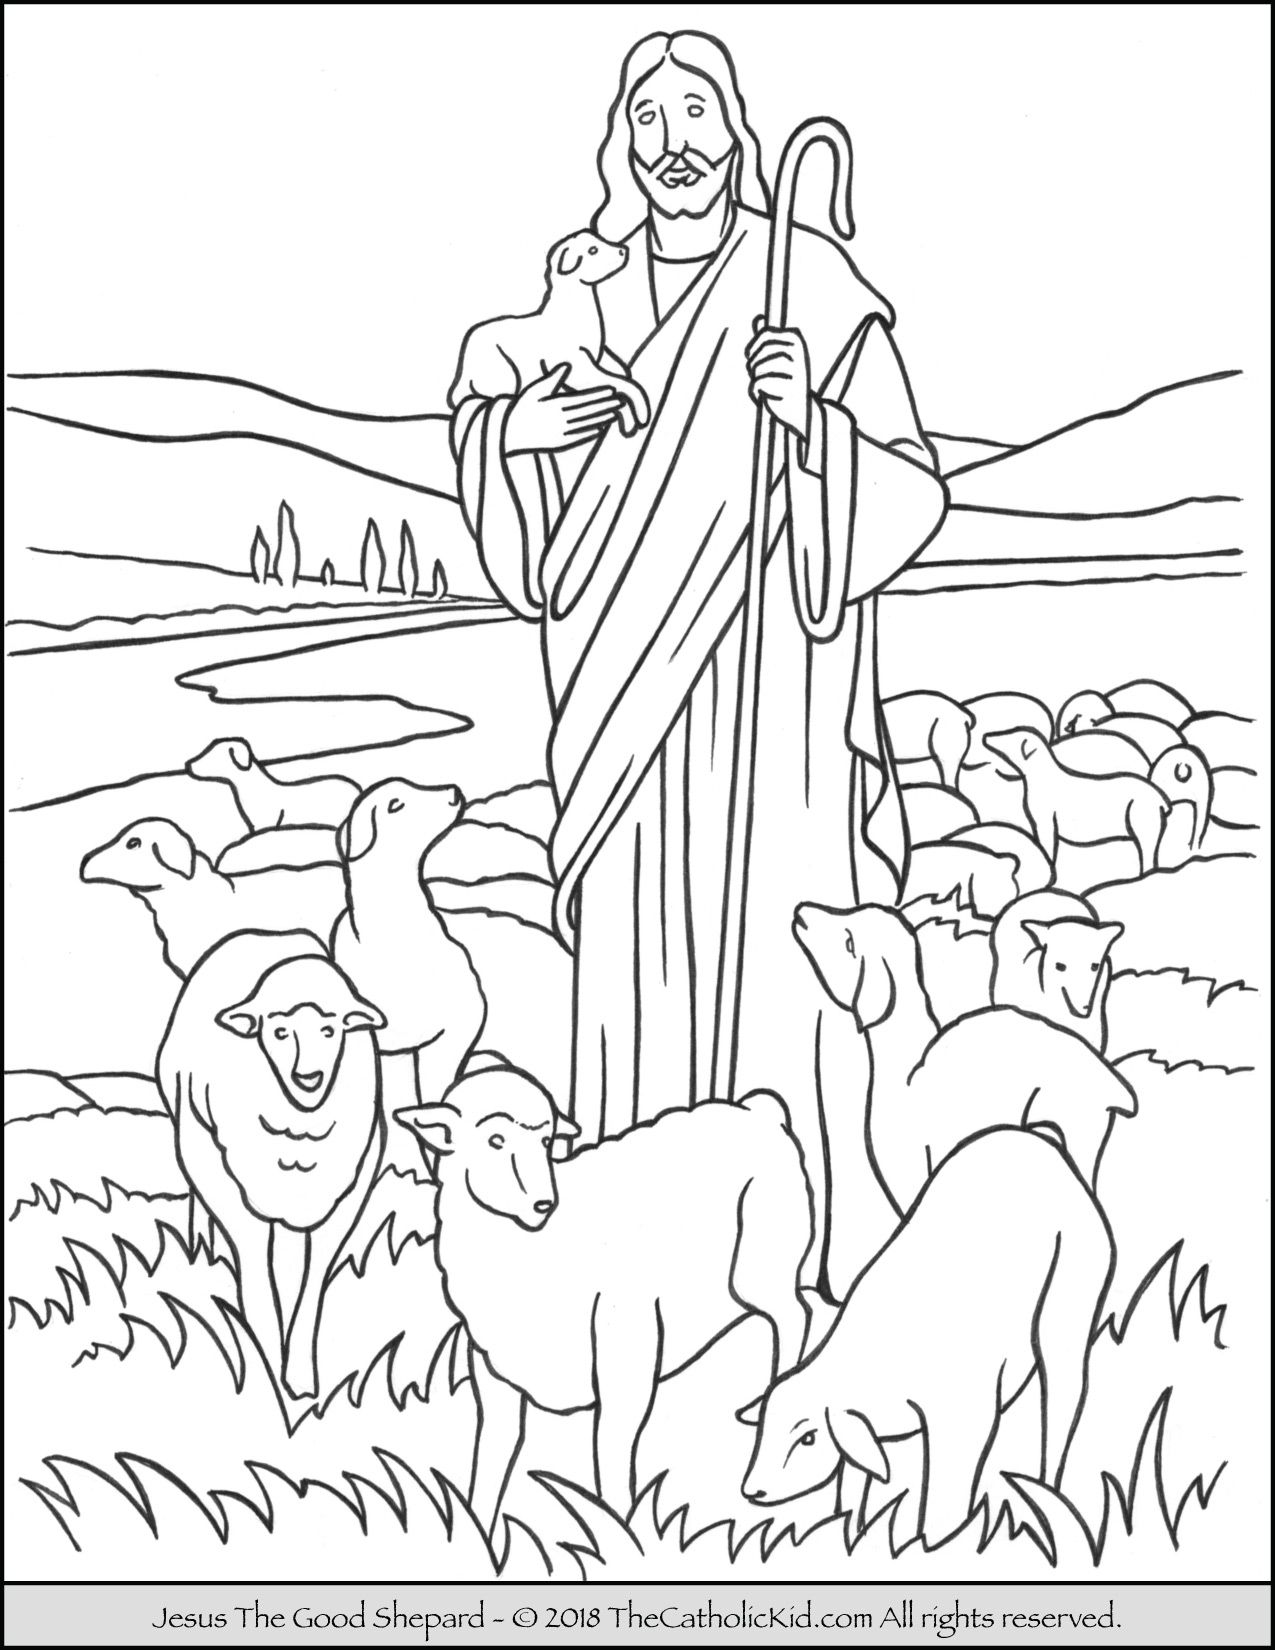 Jesus The Good Shepard Coloring Page Jesus Coloring Pages Good Shepard Sunday School Coloring Pages